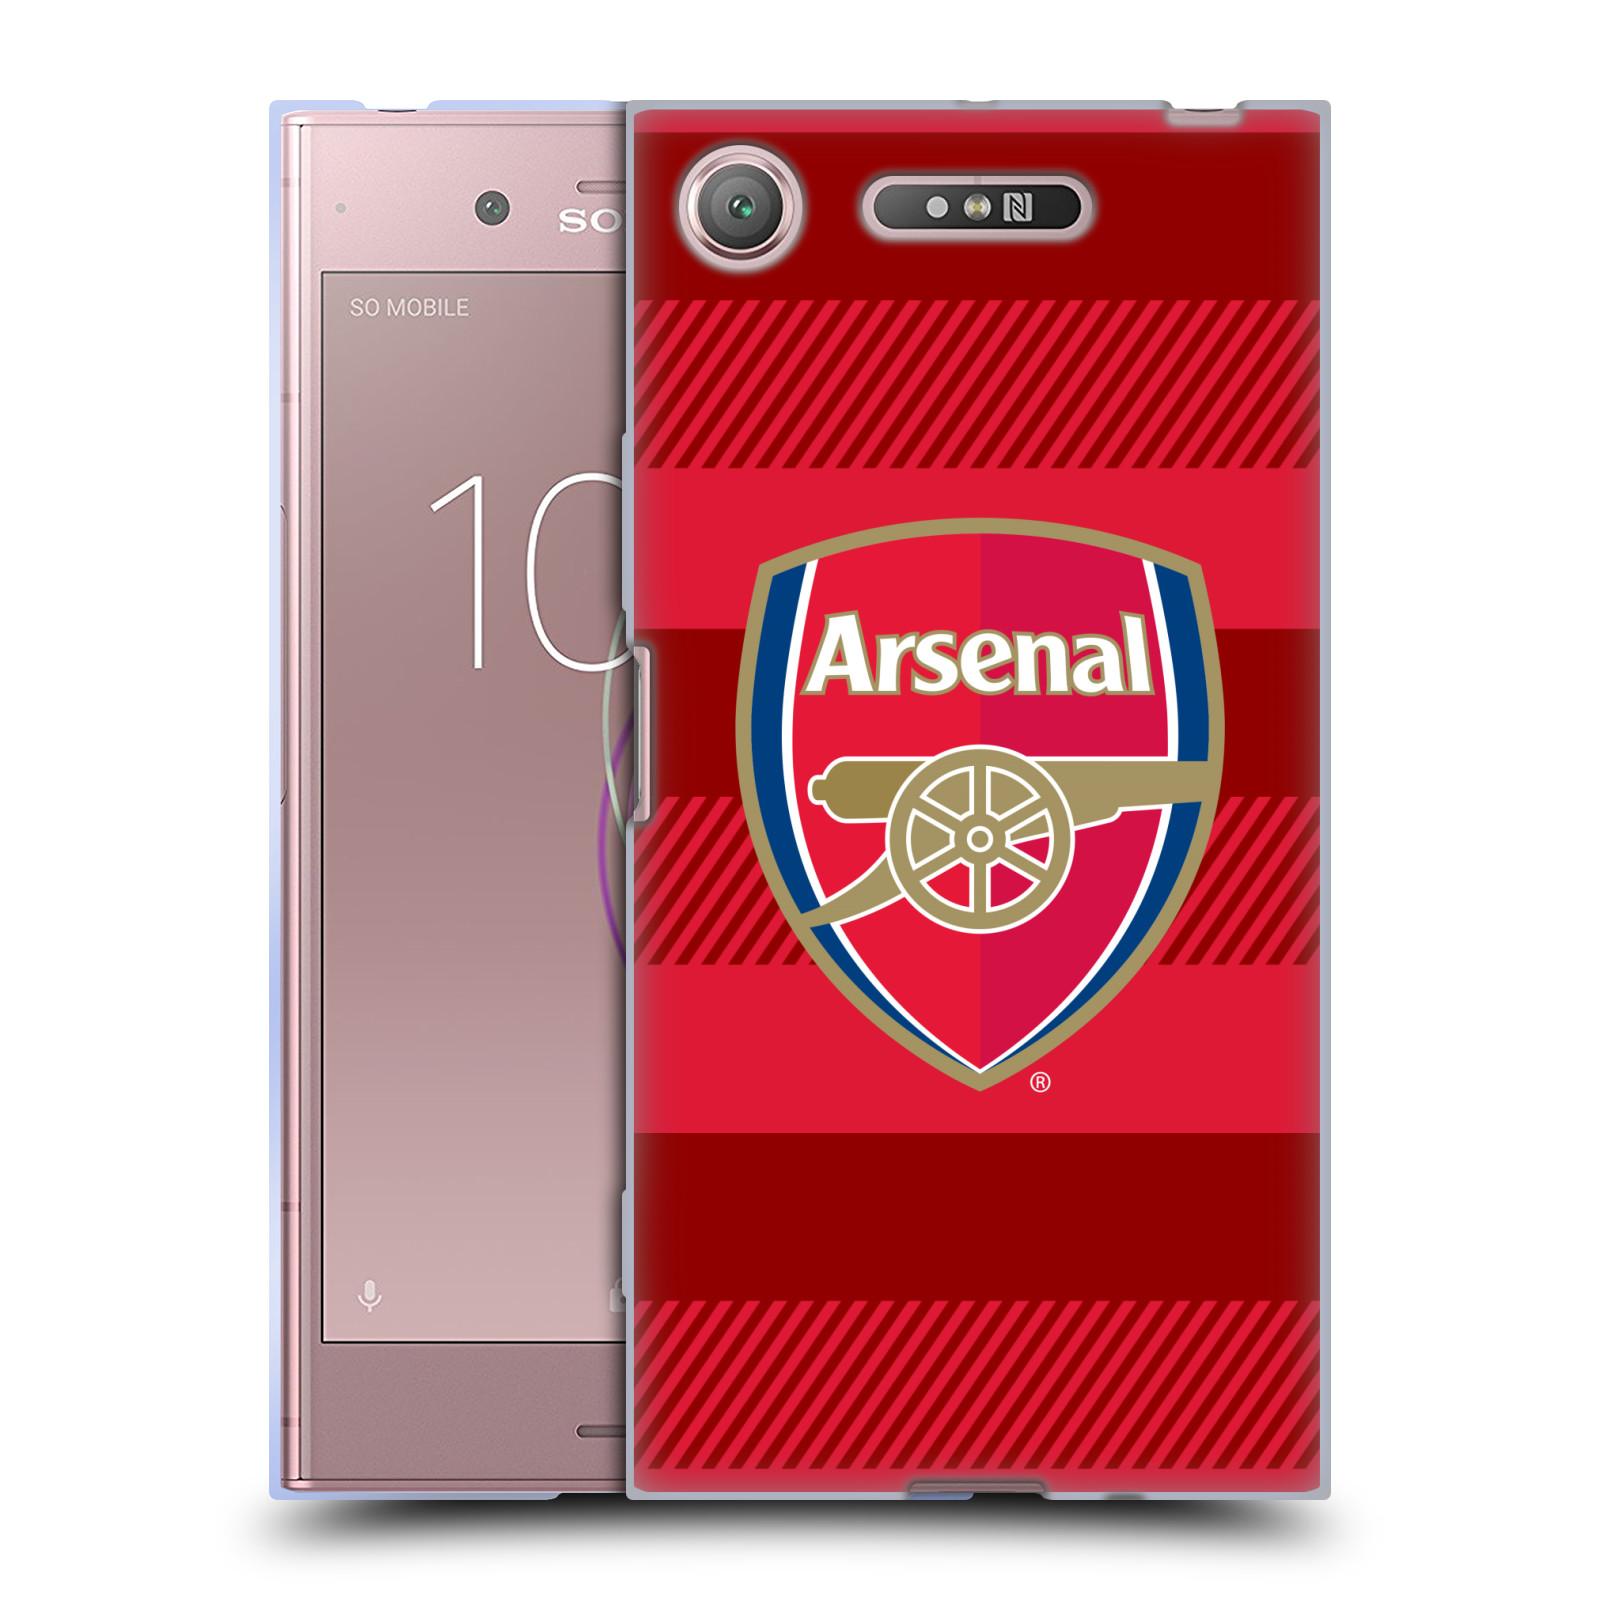 Silikonové pouzdro na mobil Sony Xperia XZ1 - Head Case - Arsenal FC - Logo s pruhy